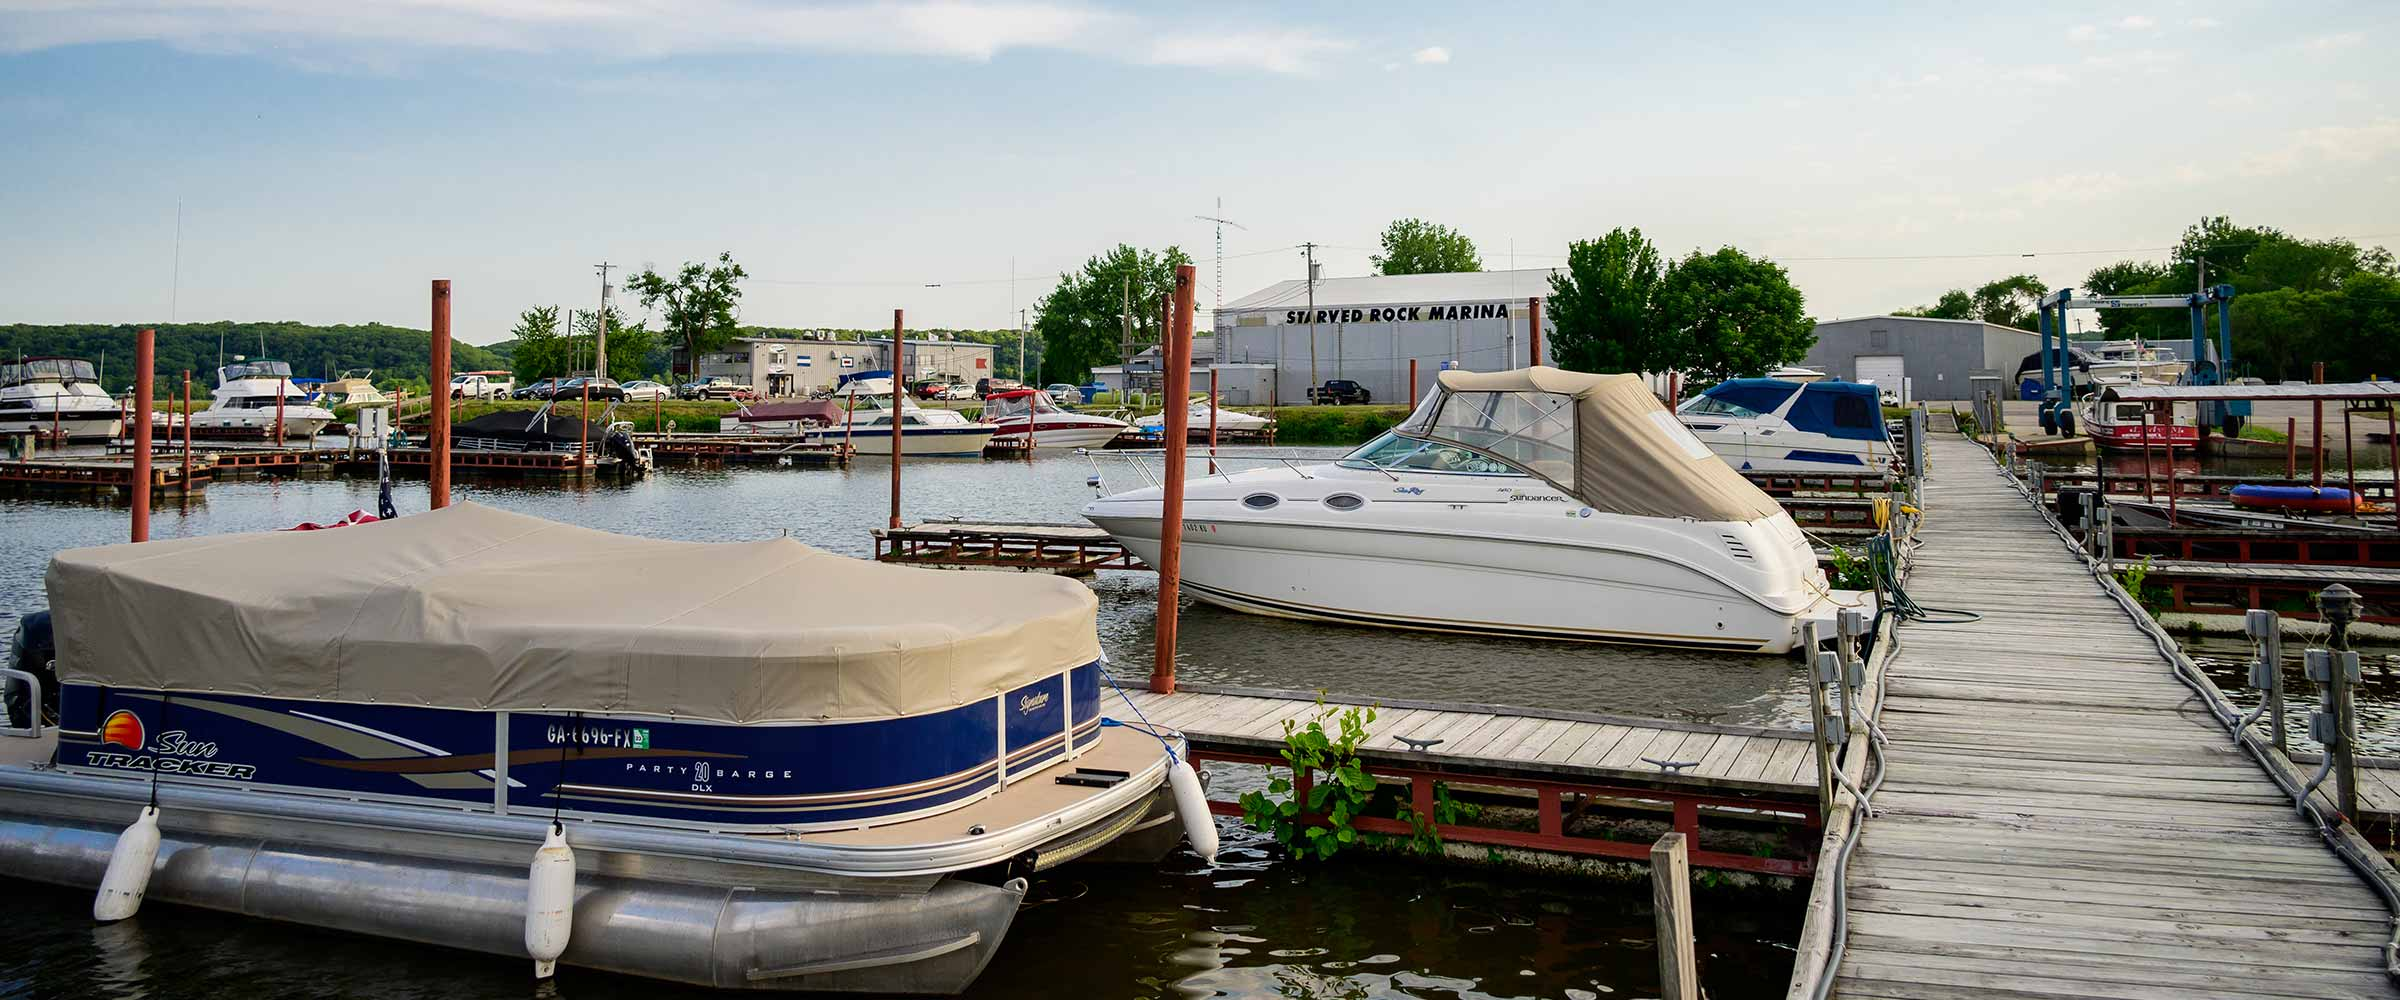 boat dock at Starved Rock Marina